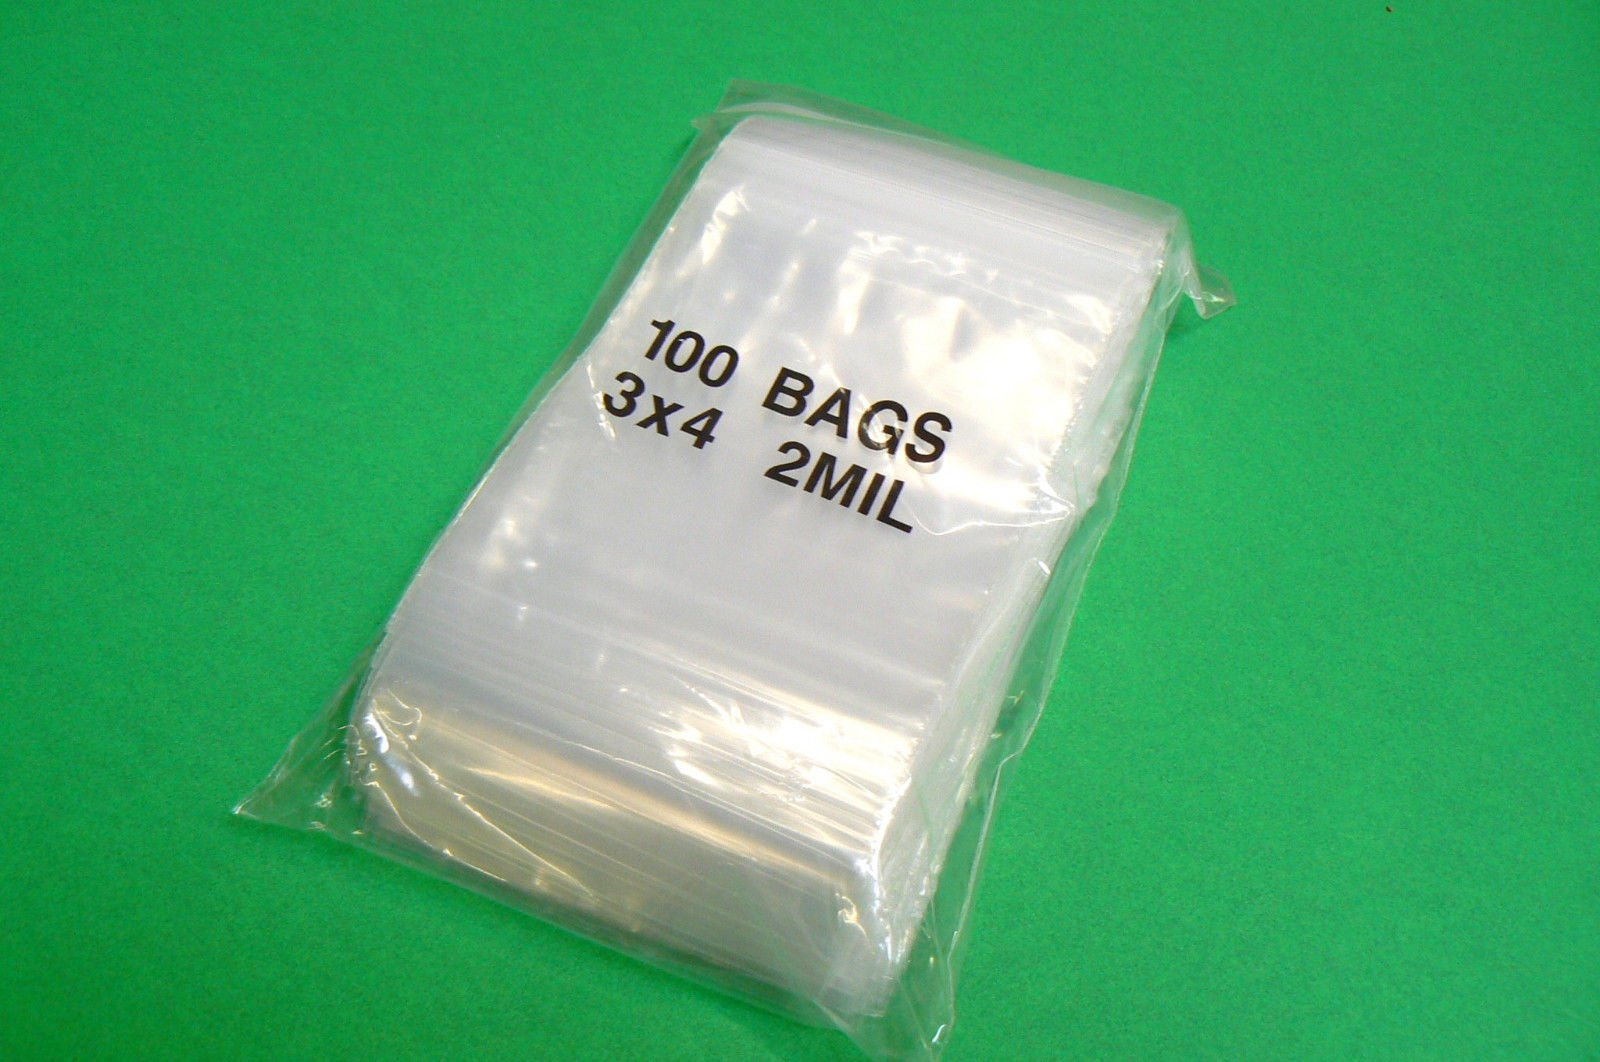 100 ZIPLOCK Bags 3x4 Clear Poly BAG RECLOSABLE 100 Baggies 2Mil 3''x4'' ZIP LOCK (E 3)